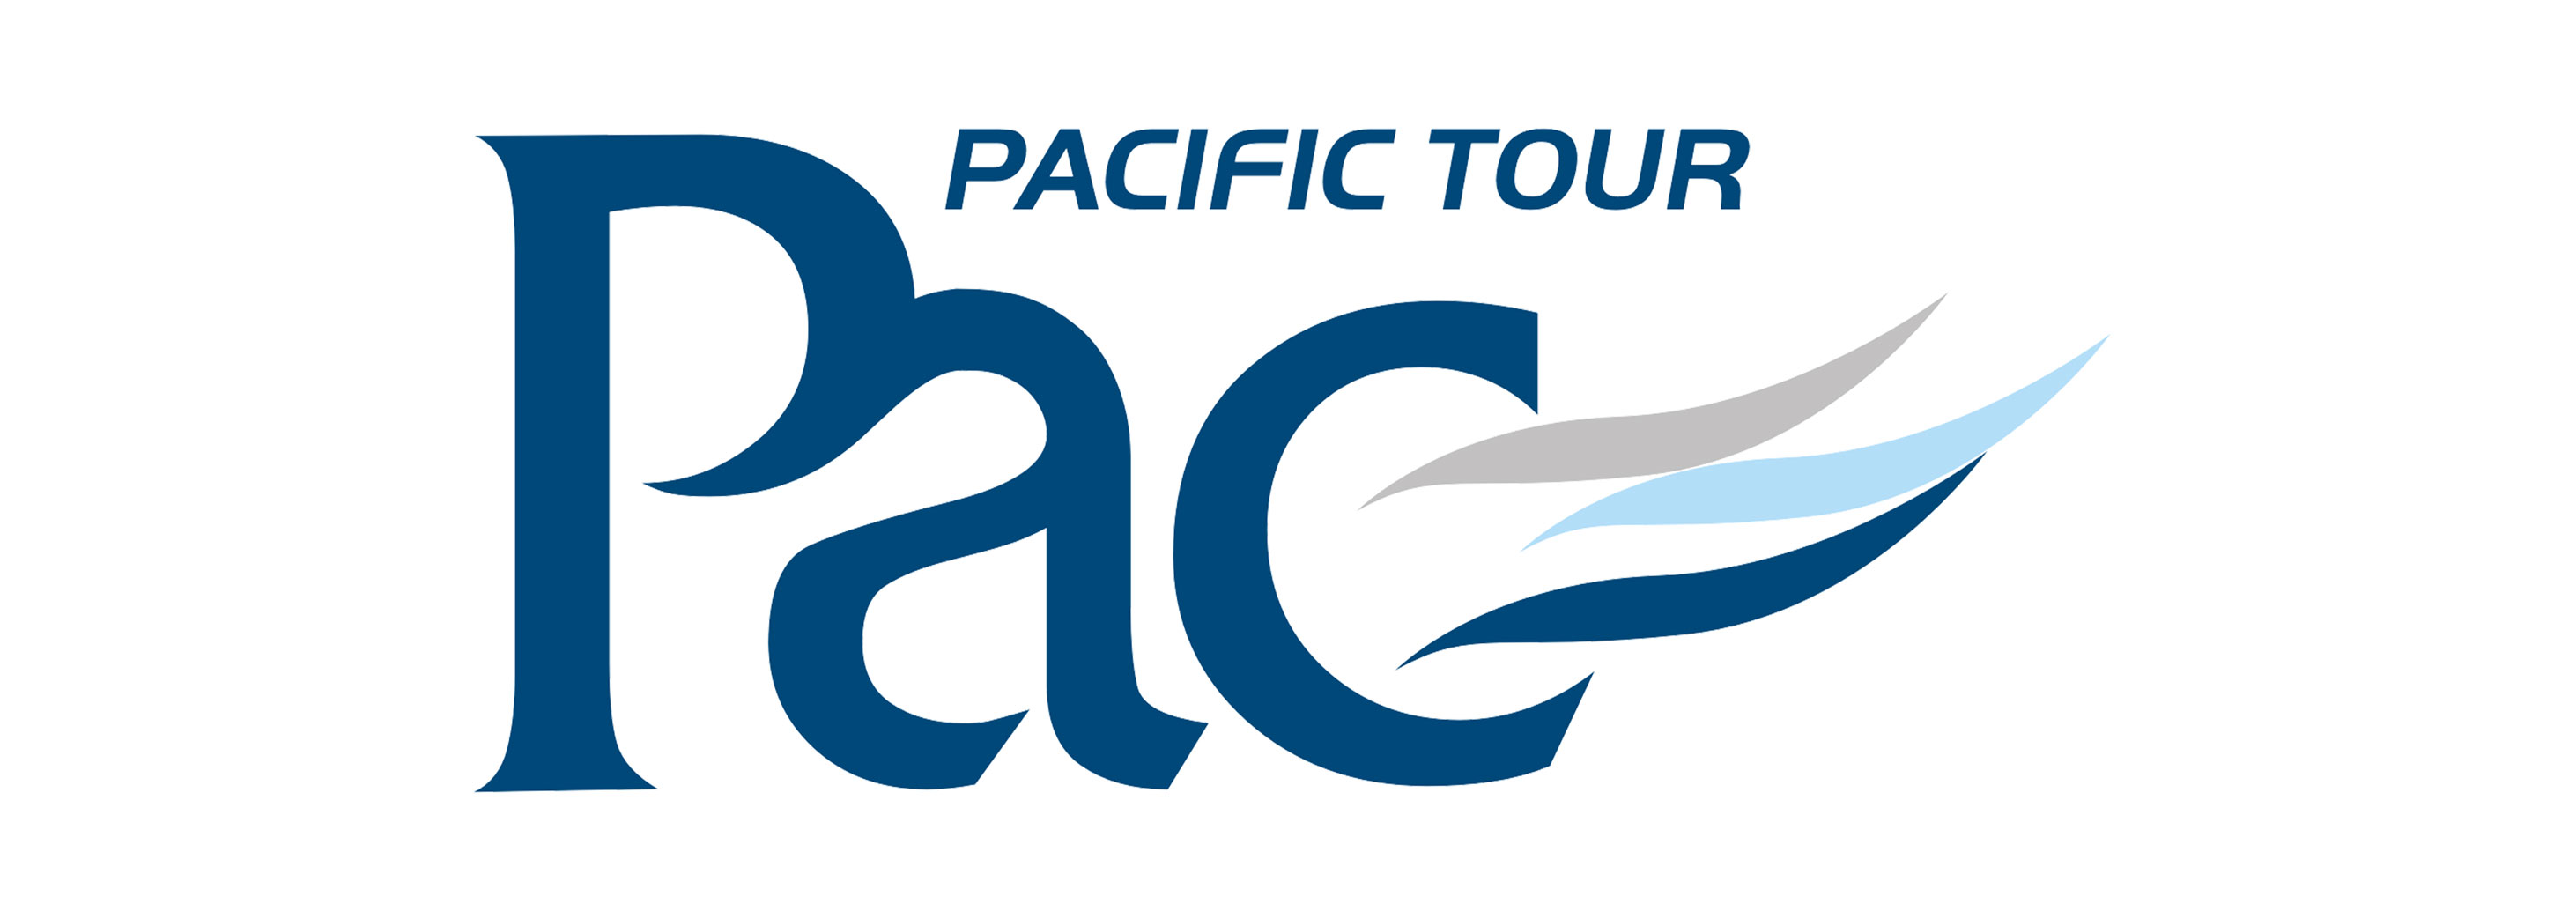 Pacific Travel Service